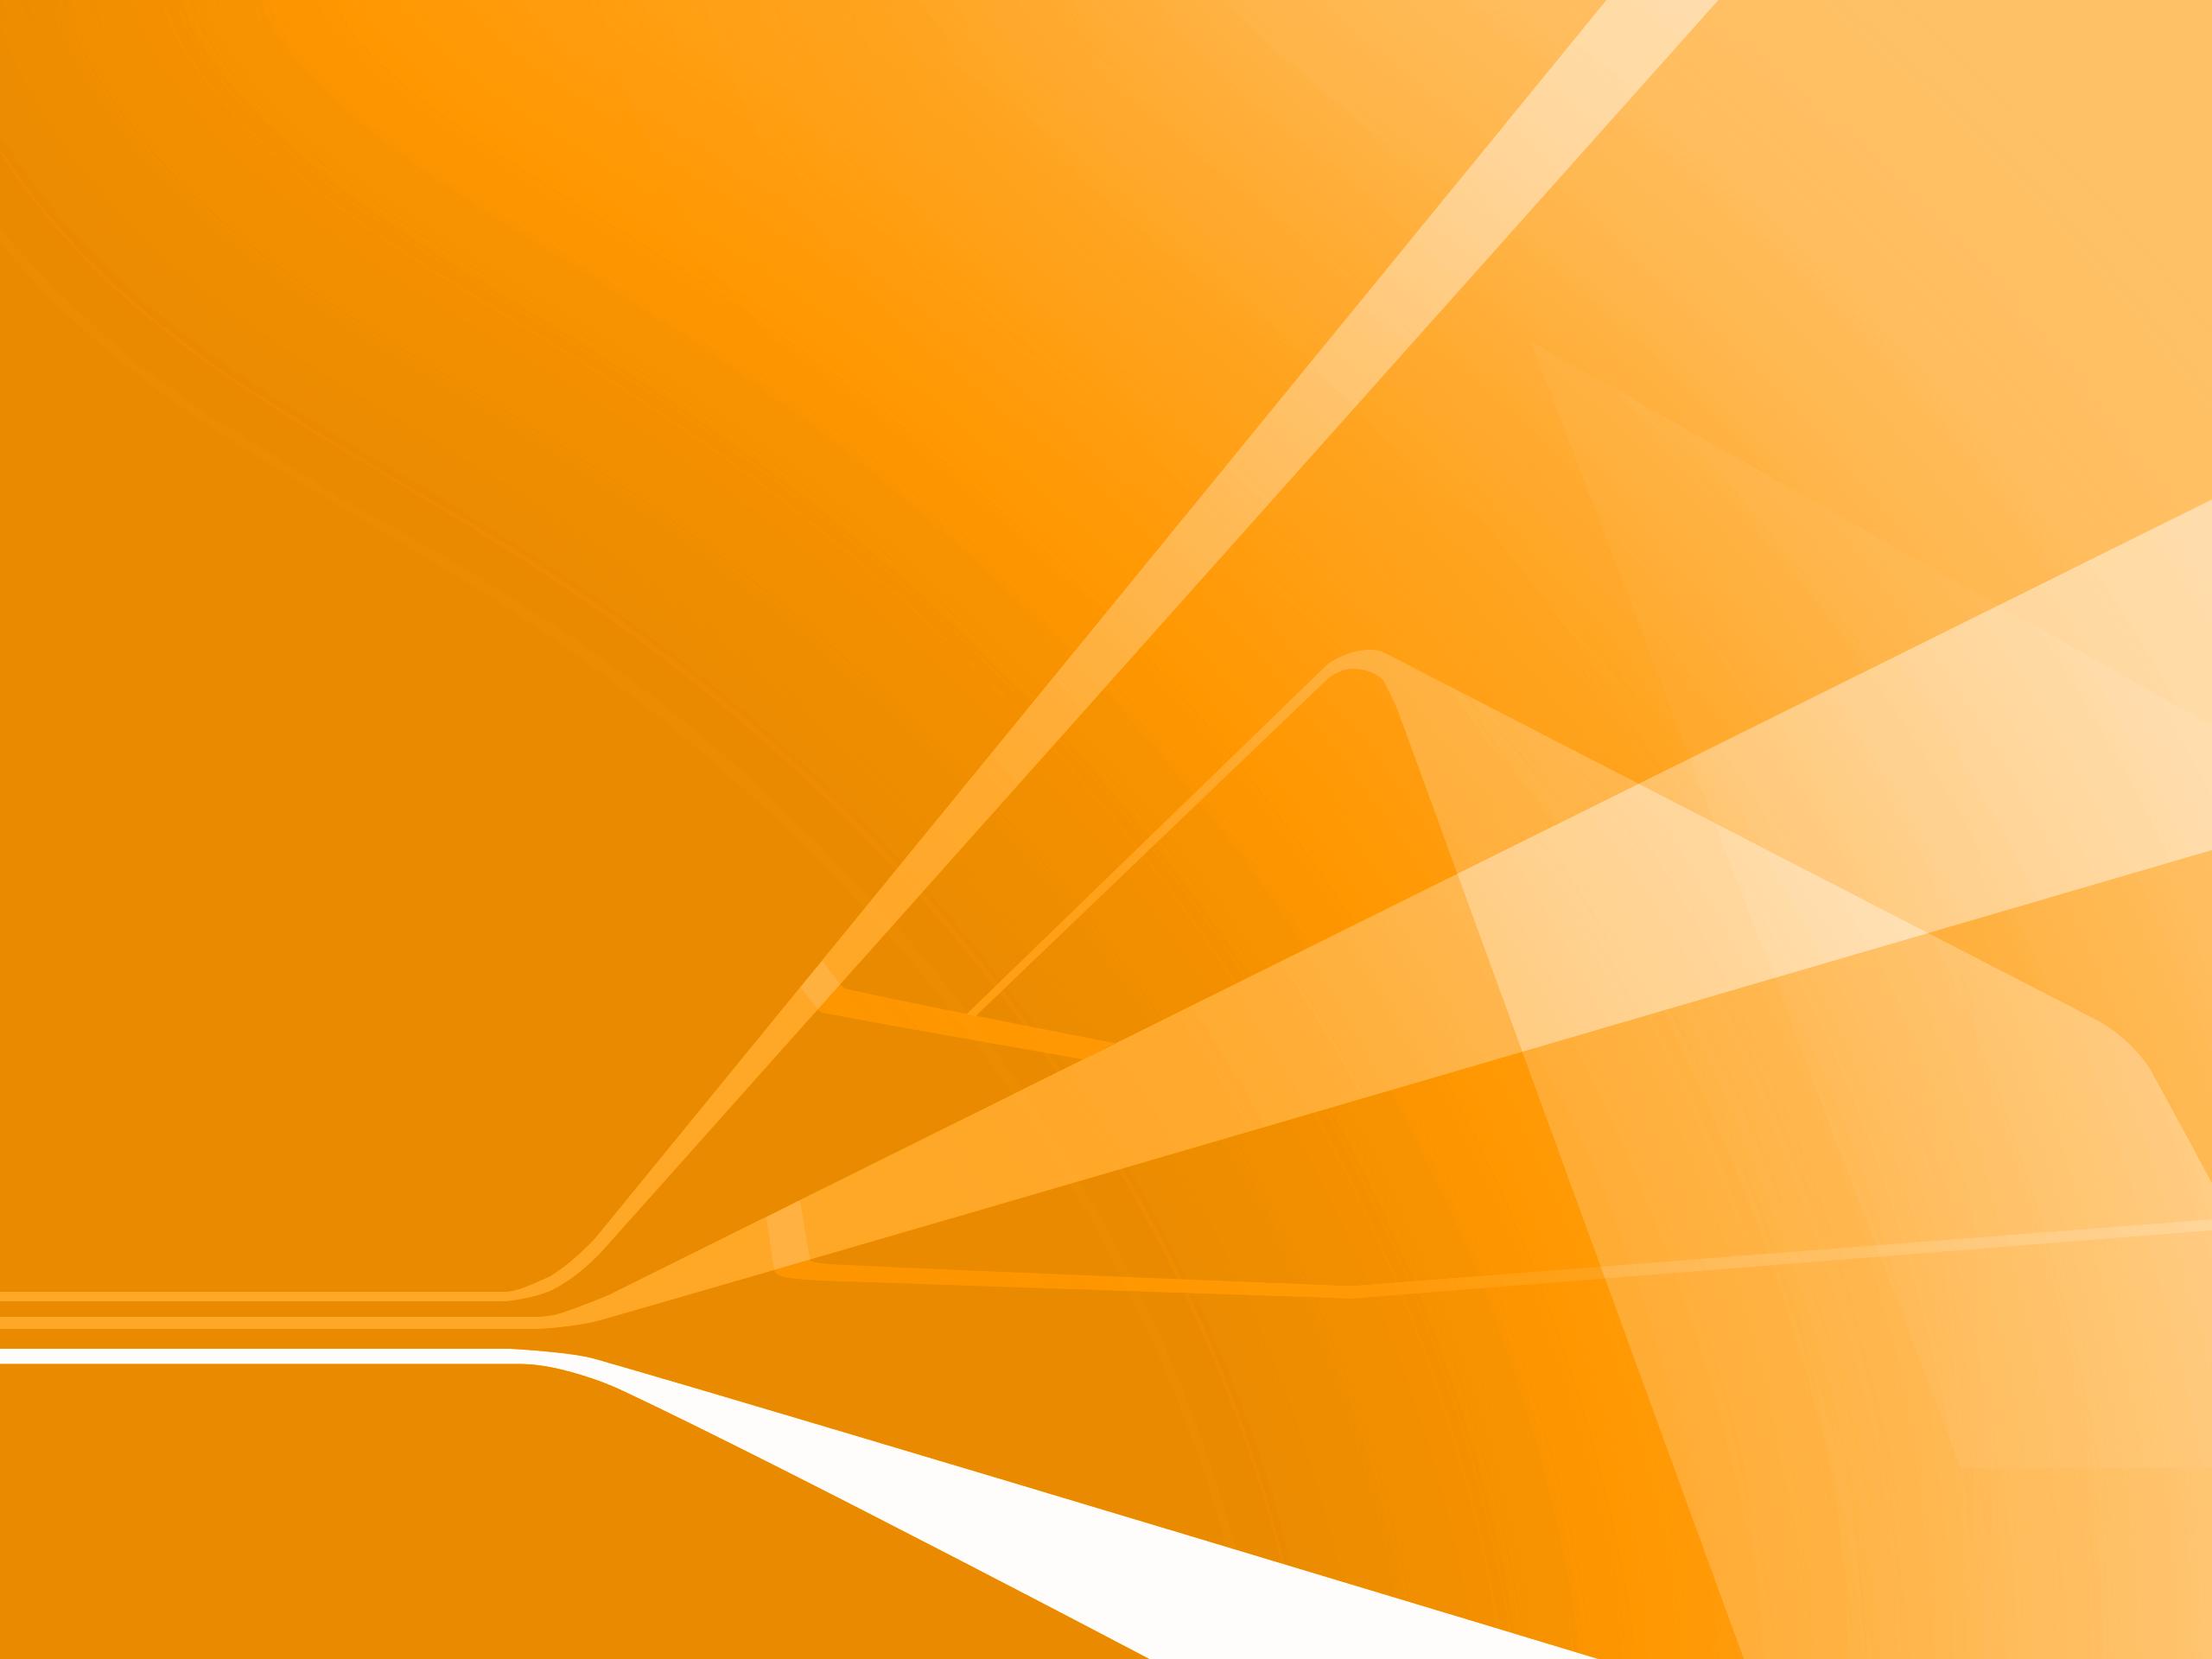 wallpaper orange 012 ROAMWORKS ASSET INTELLIGENCE 2560x1920